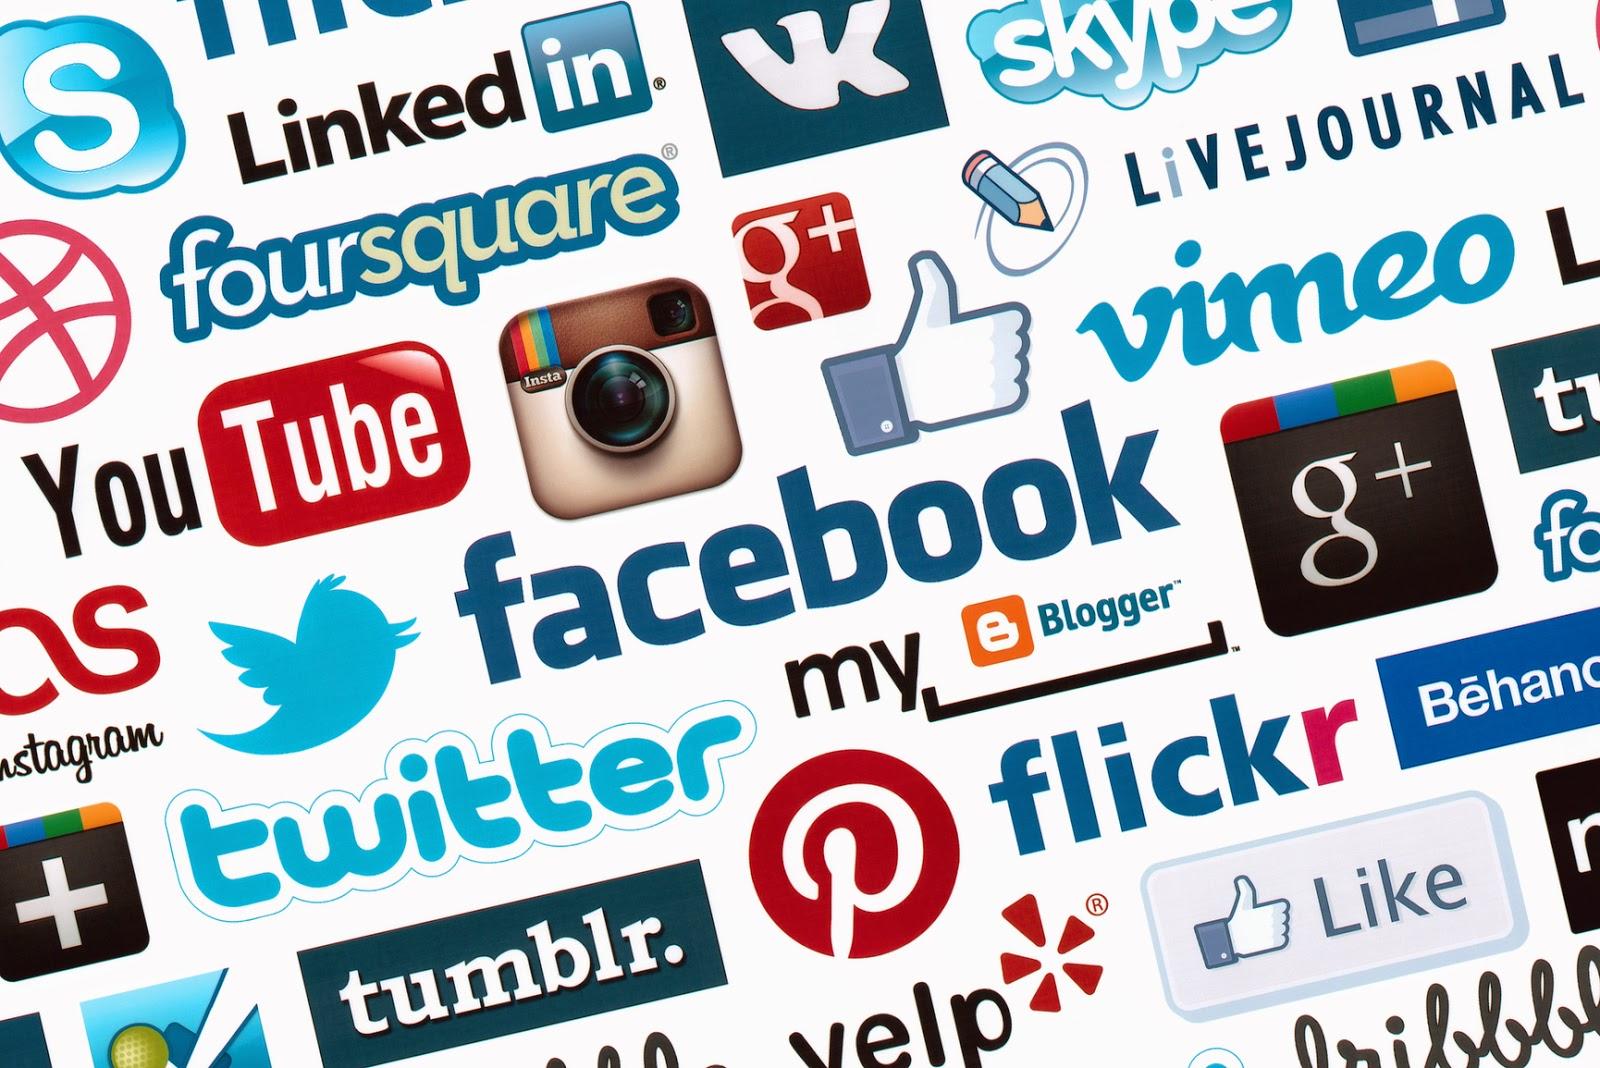 Add Social Media to Your Blog, Website etc